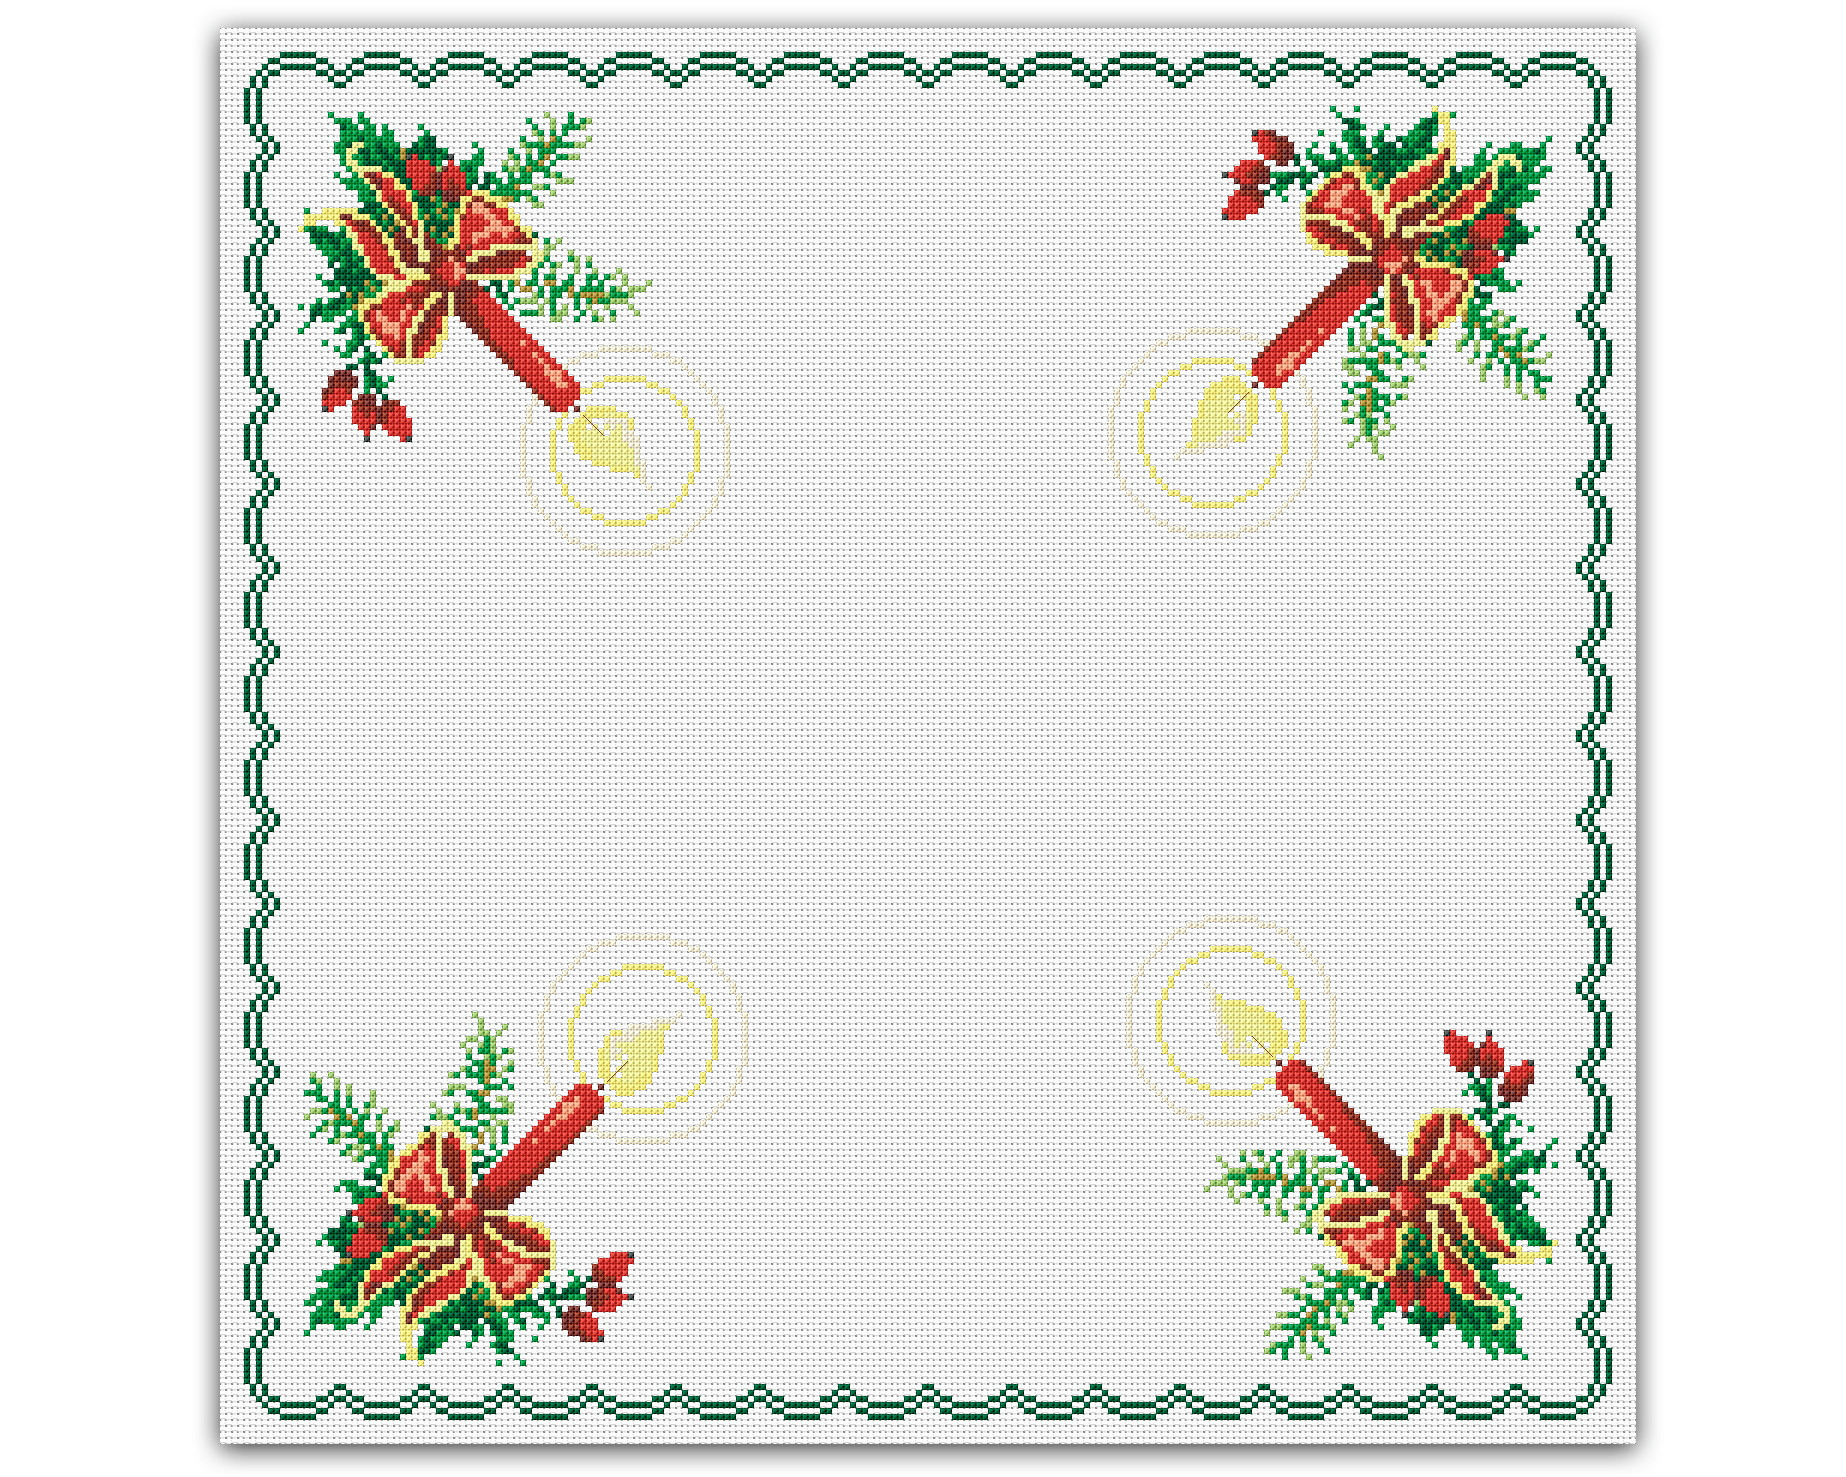 Velas De Natal Grafico Ponto Cruz No Elo7 Thimage Graficos